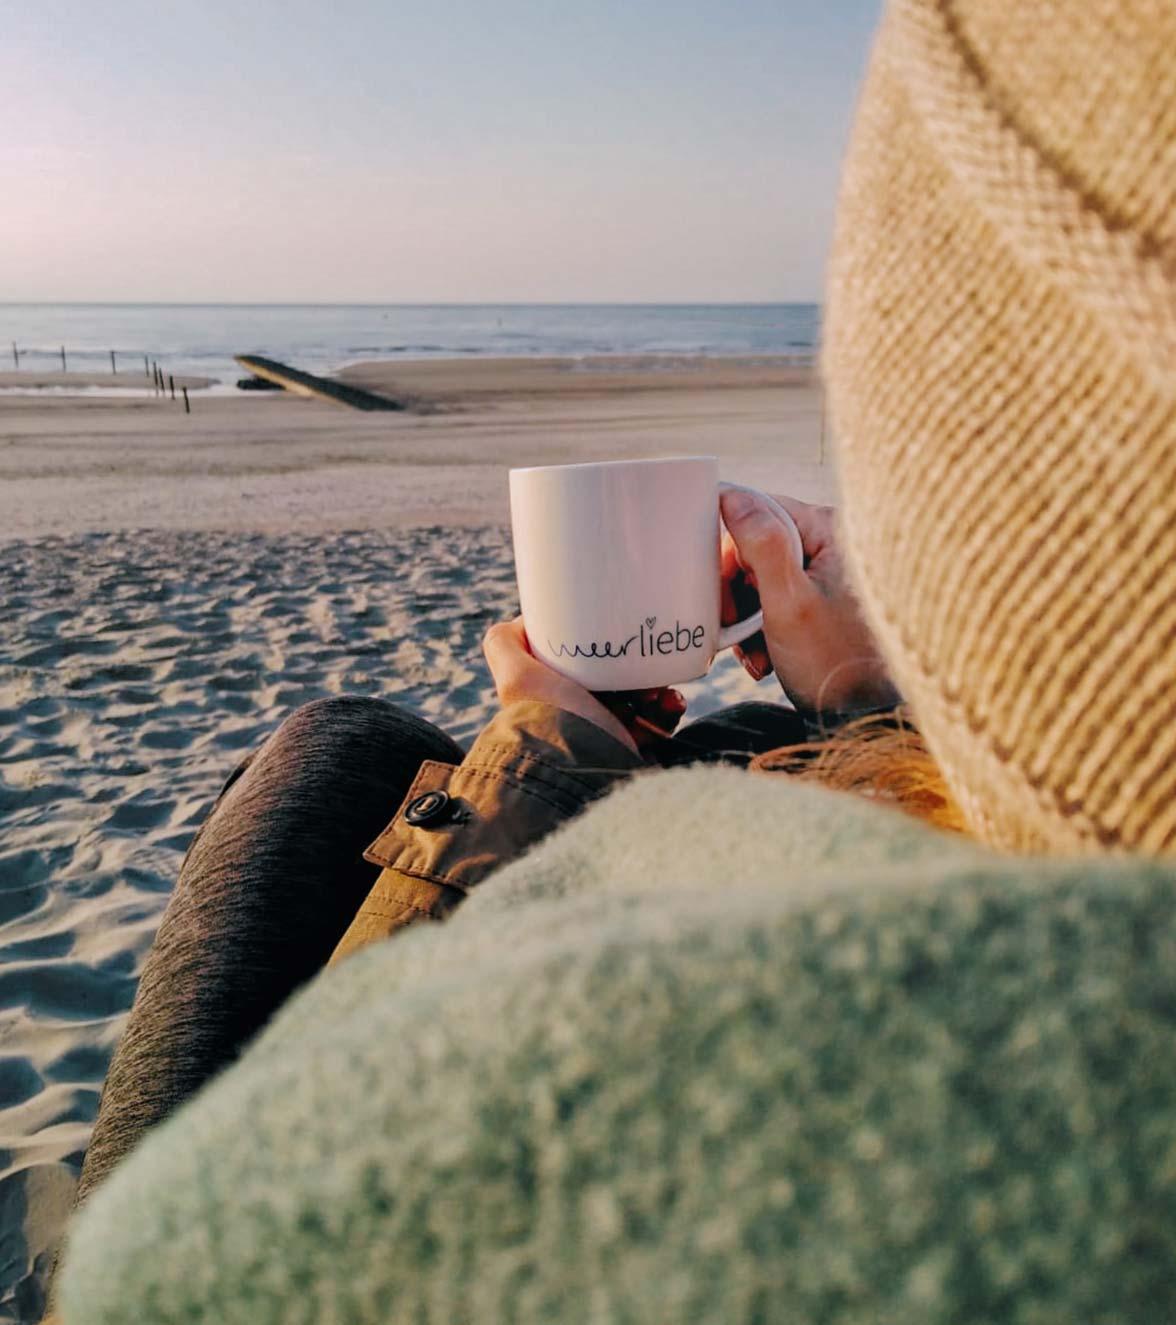 meerliebe-tasse-am-strand